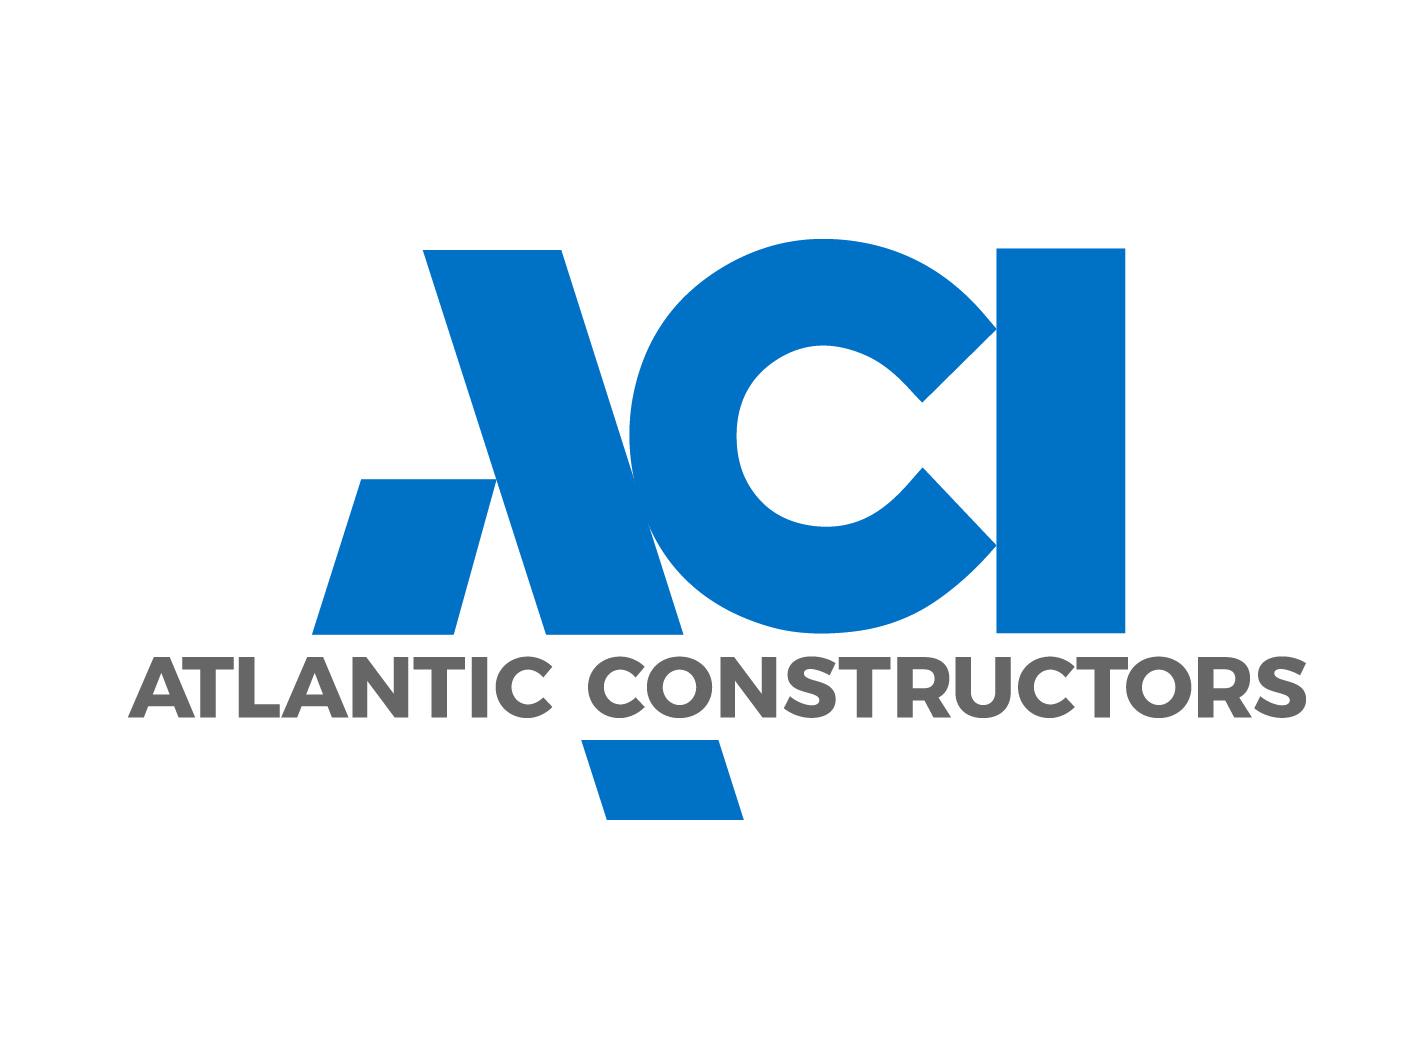 Atlantic Constructors Logo 2017.JPG